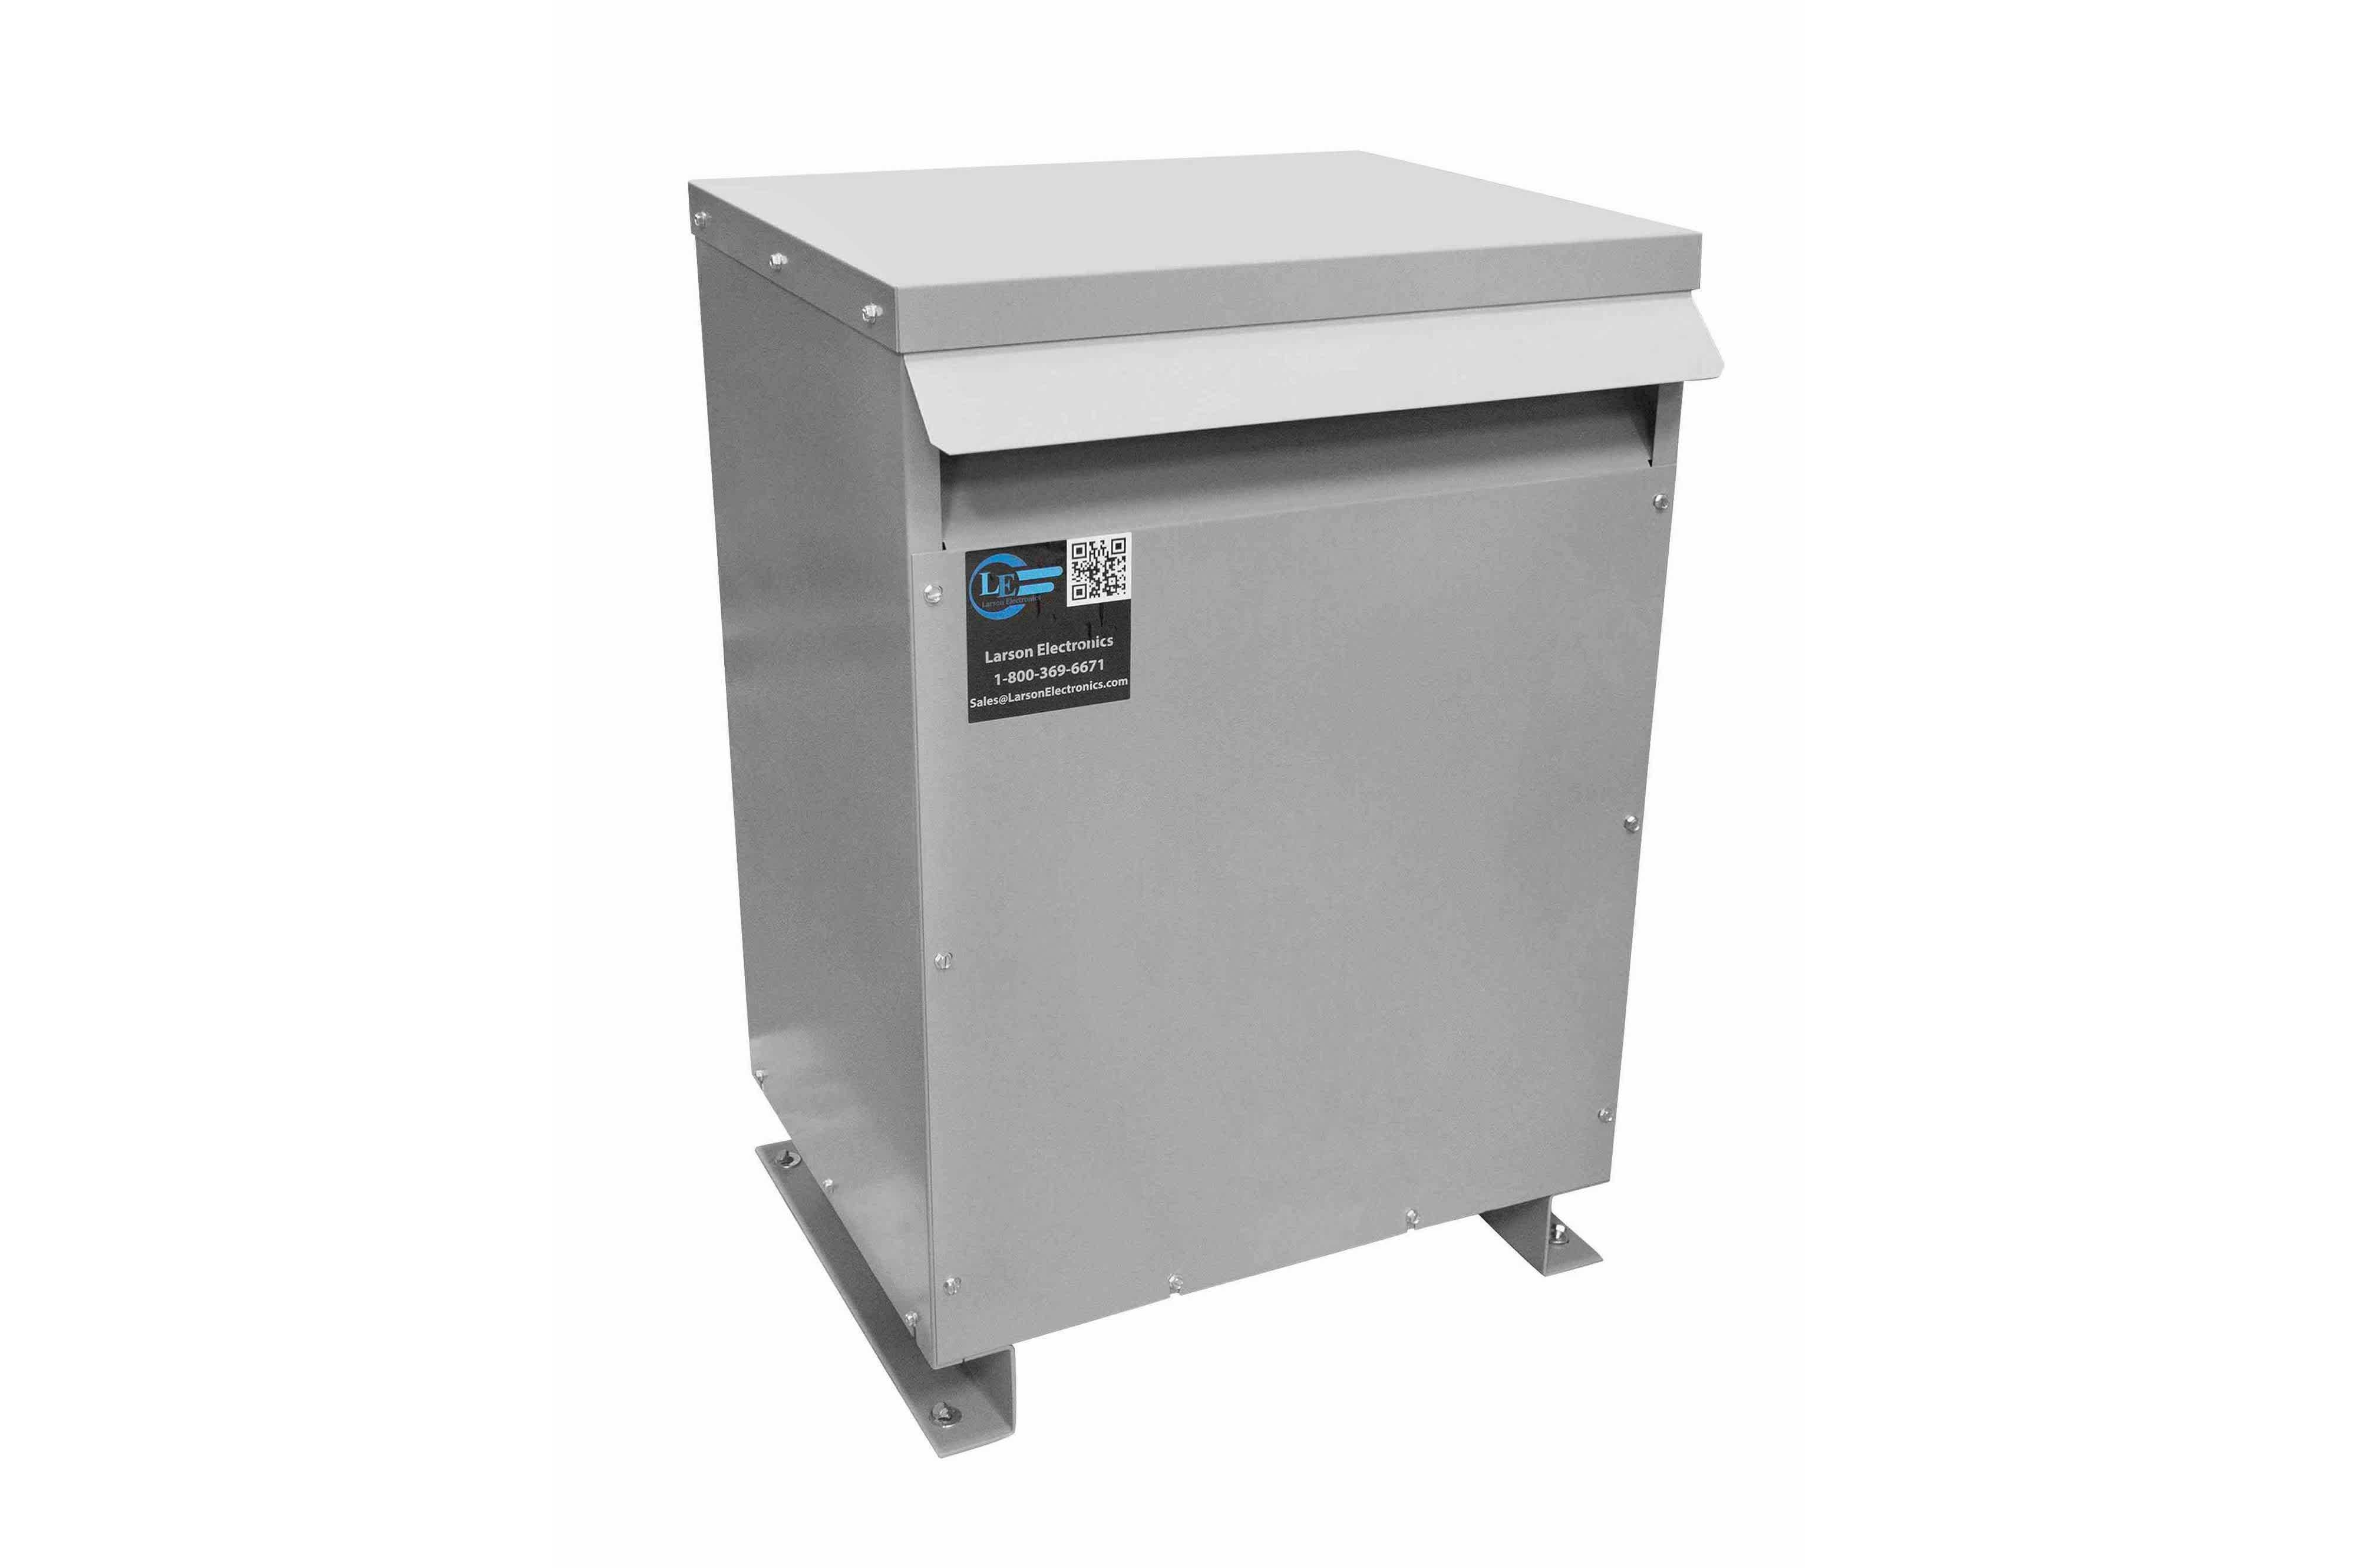 42.5 kVA 3PH Isolation Transformer, 600V Wye Primary, 480V Delta Secondary, N3R, Ventilated, 60 Hz